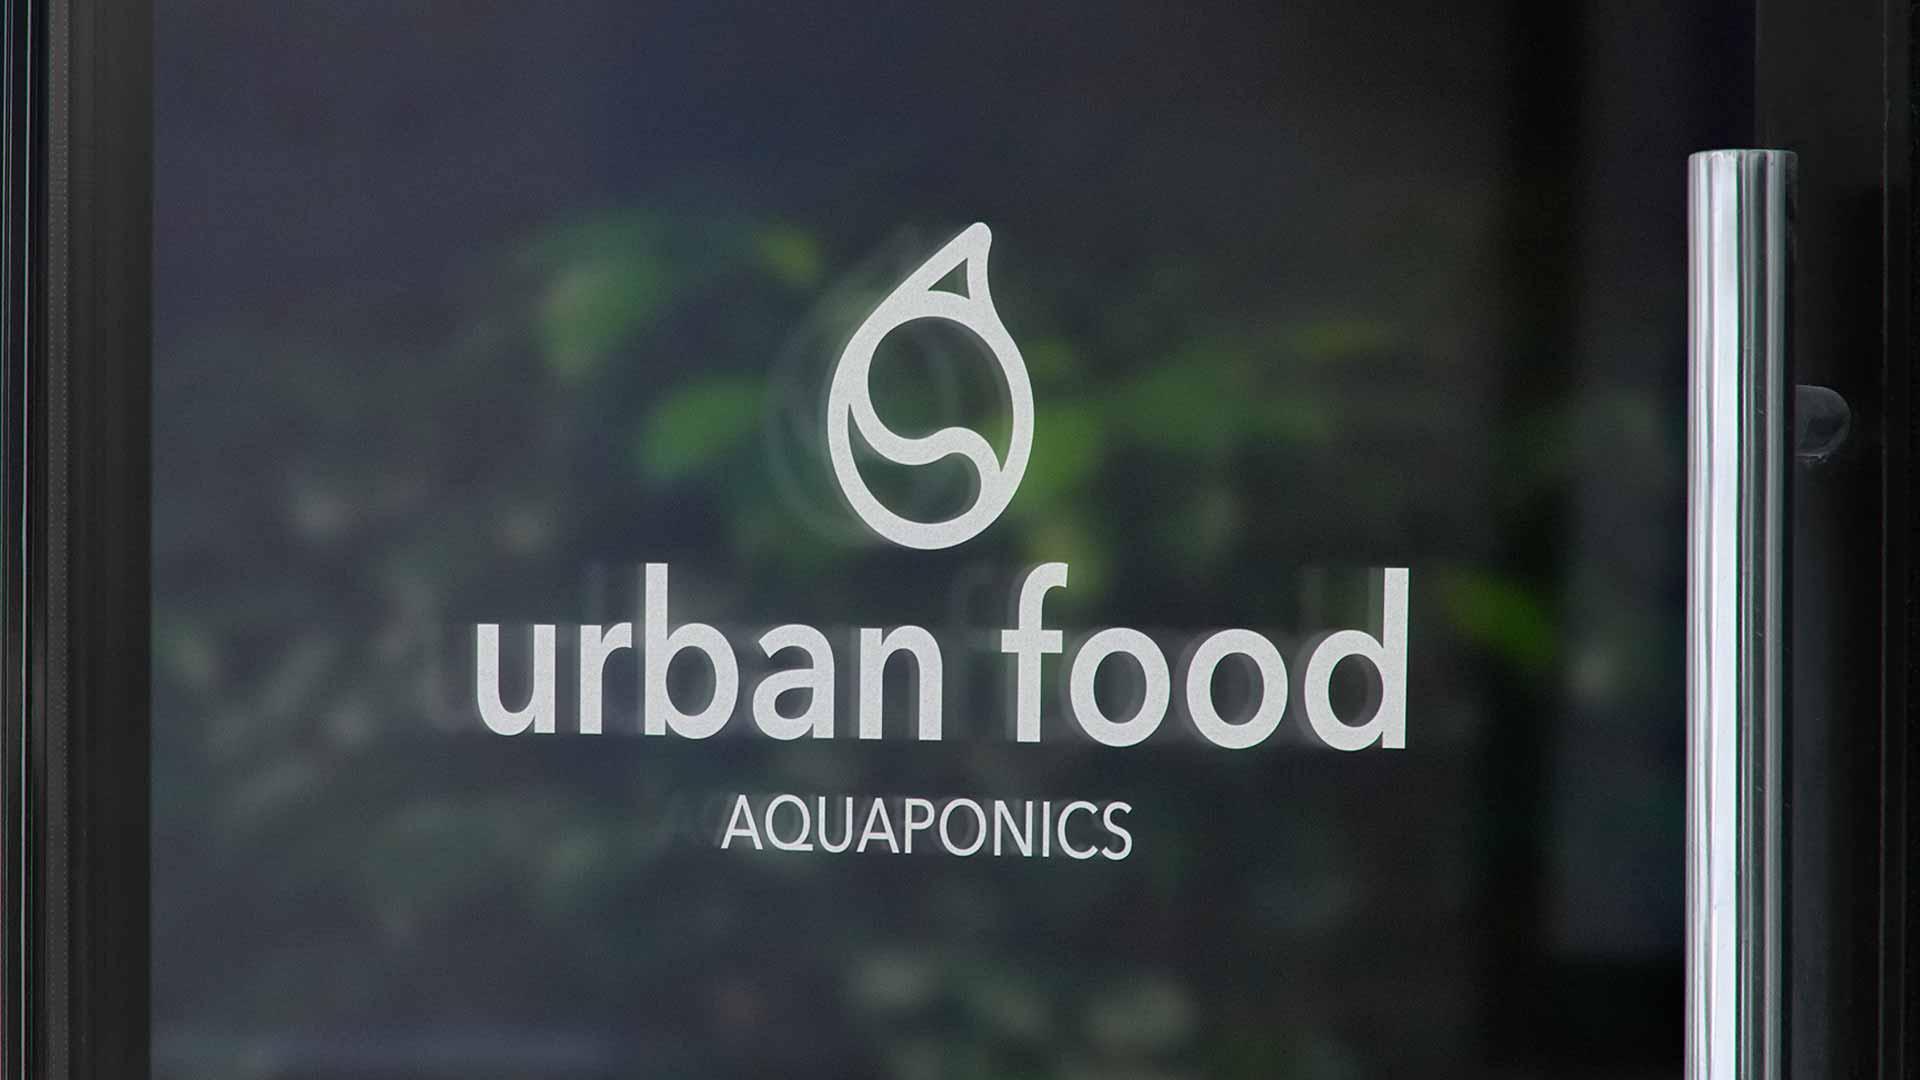 biota urban food mainb banner